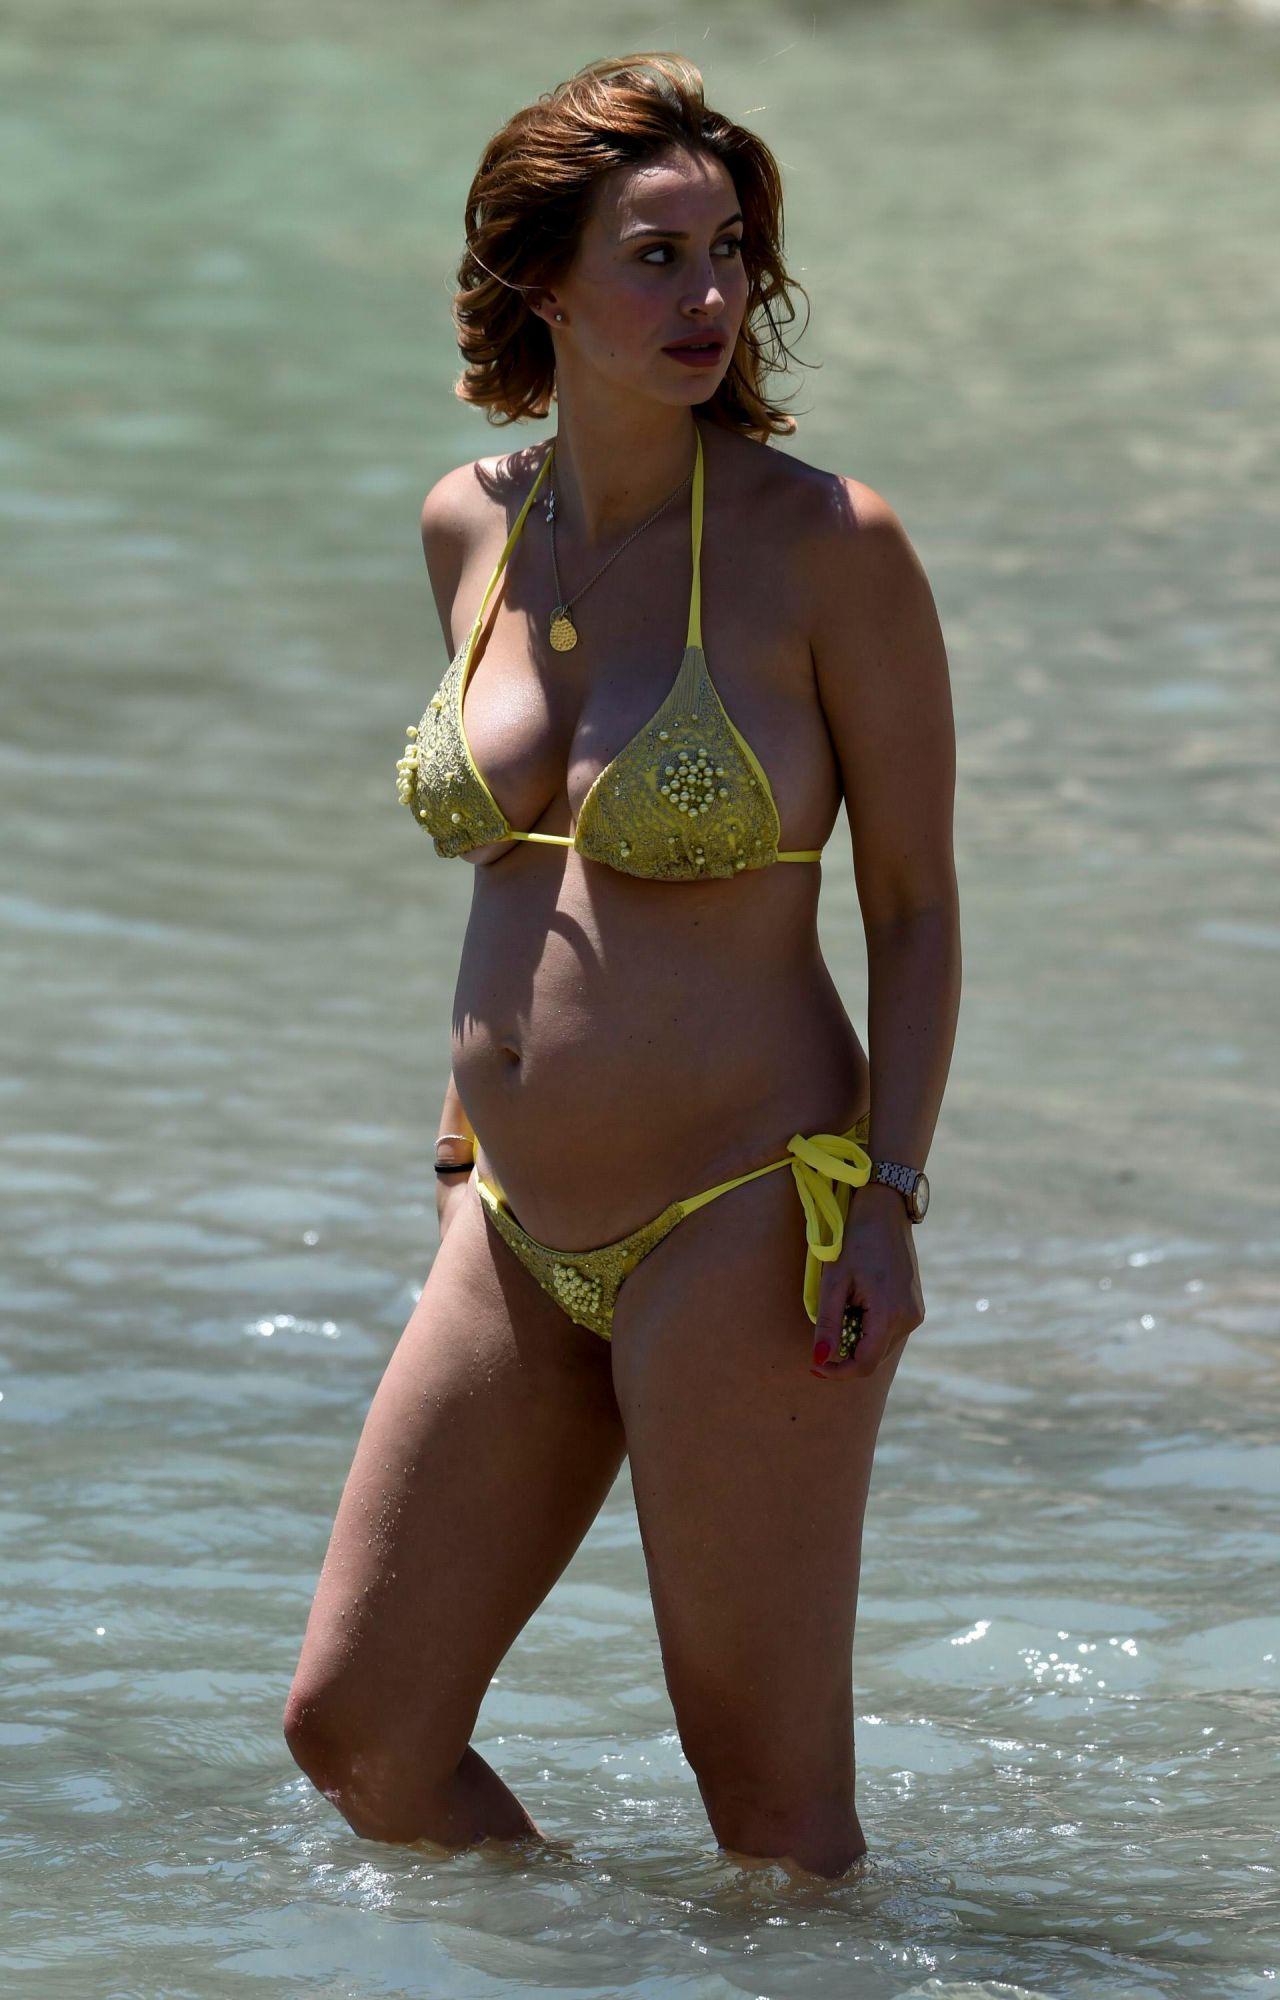 ferne-mccann-in-yellow-bikini-on-beach-in-majorca-spain-07-07-2017-10.jpg (1280×2000)